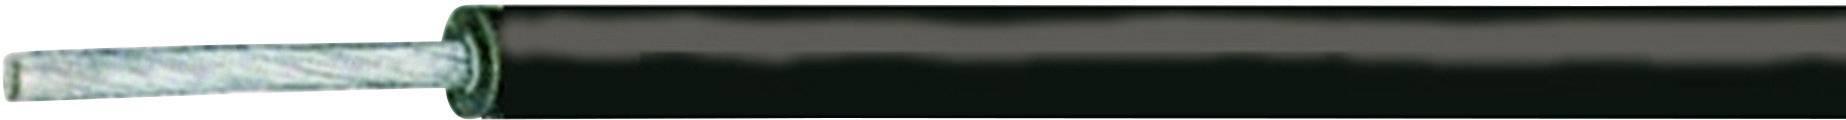 Stikalna žica SiL-SiAF 1 x 2.50 mm, bela XBK Kabel cena za meter